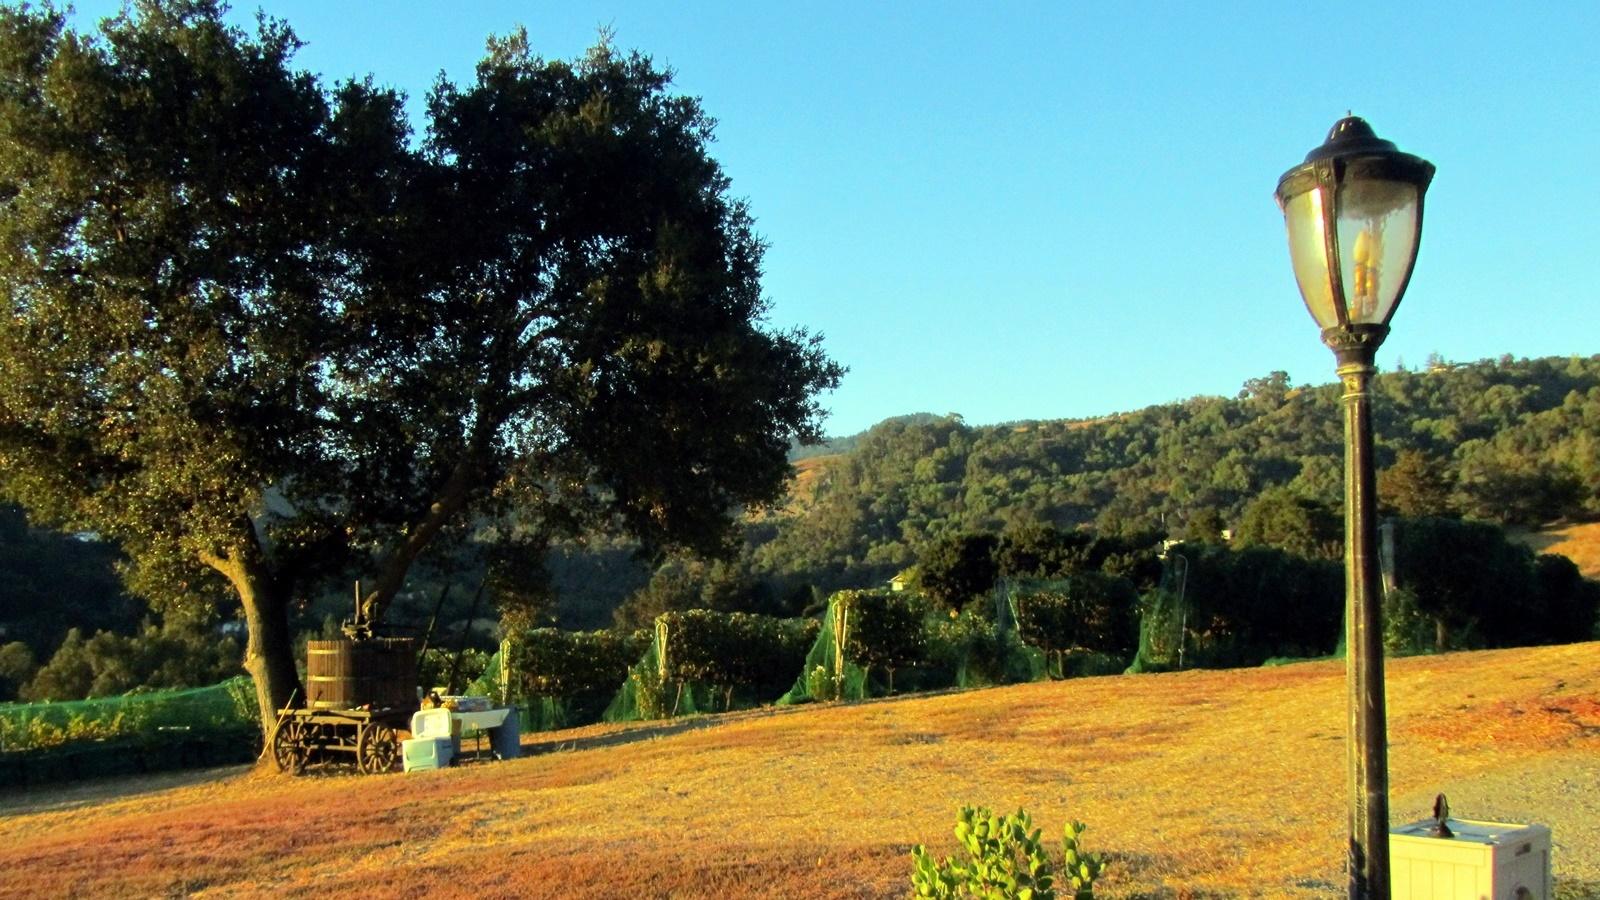 1 Vineyard at dawn